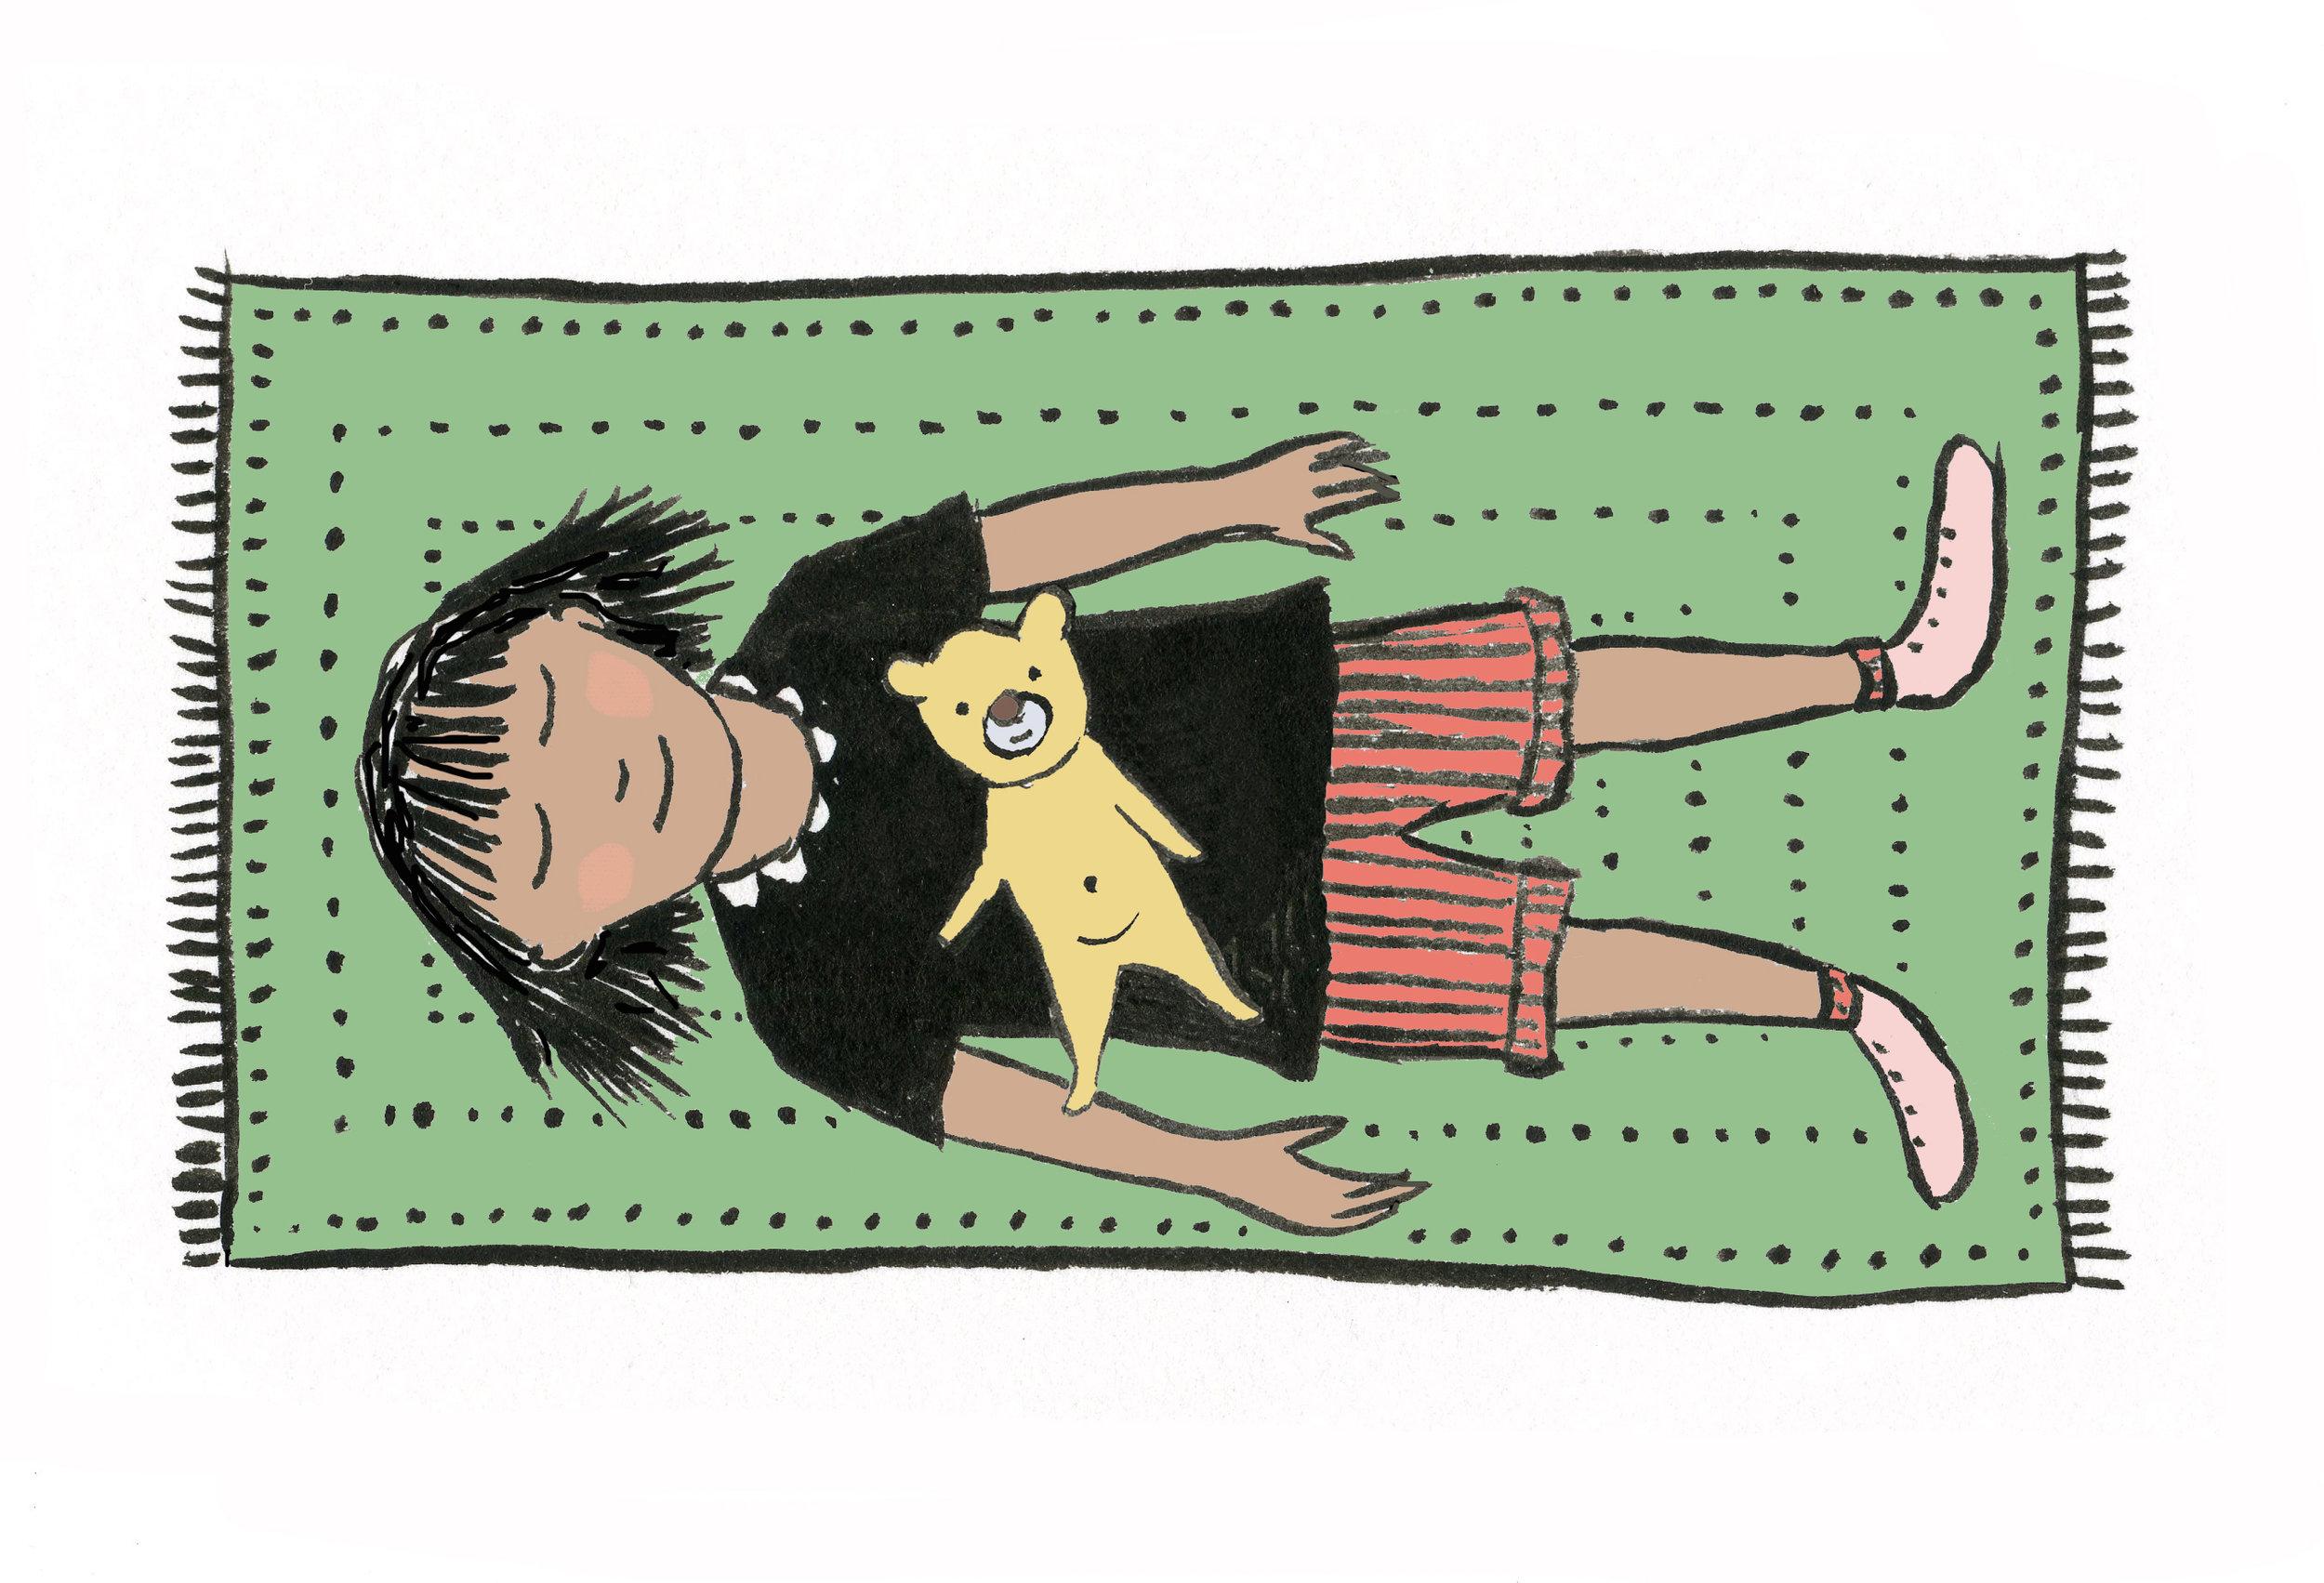 Activity-based mindfulness for kids